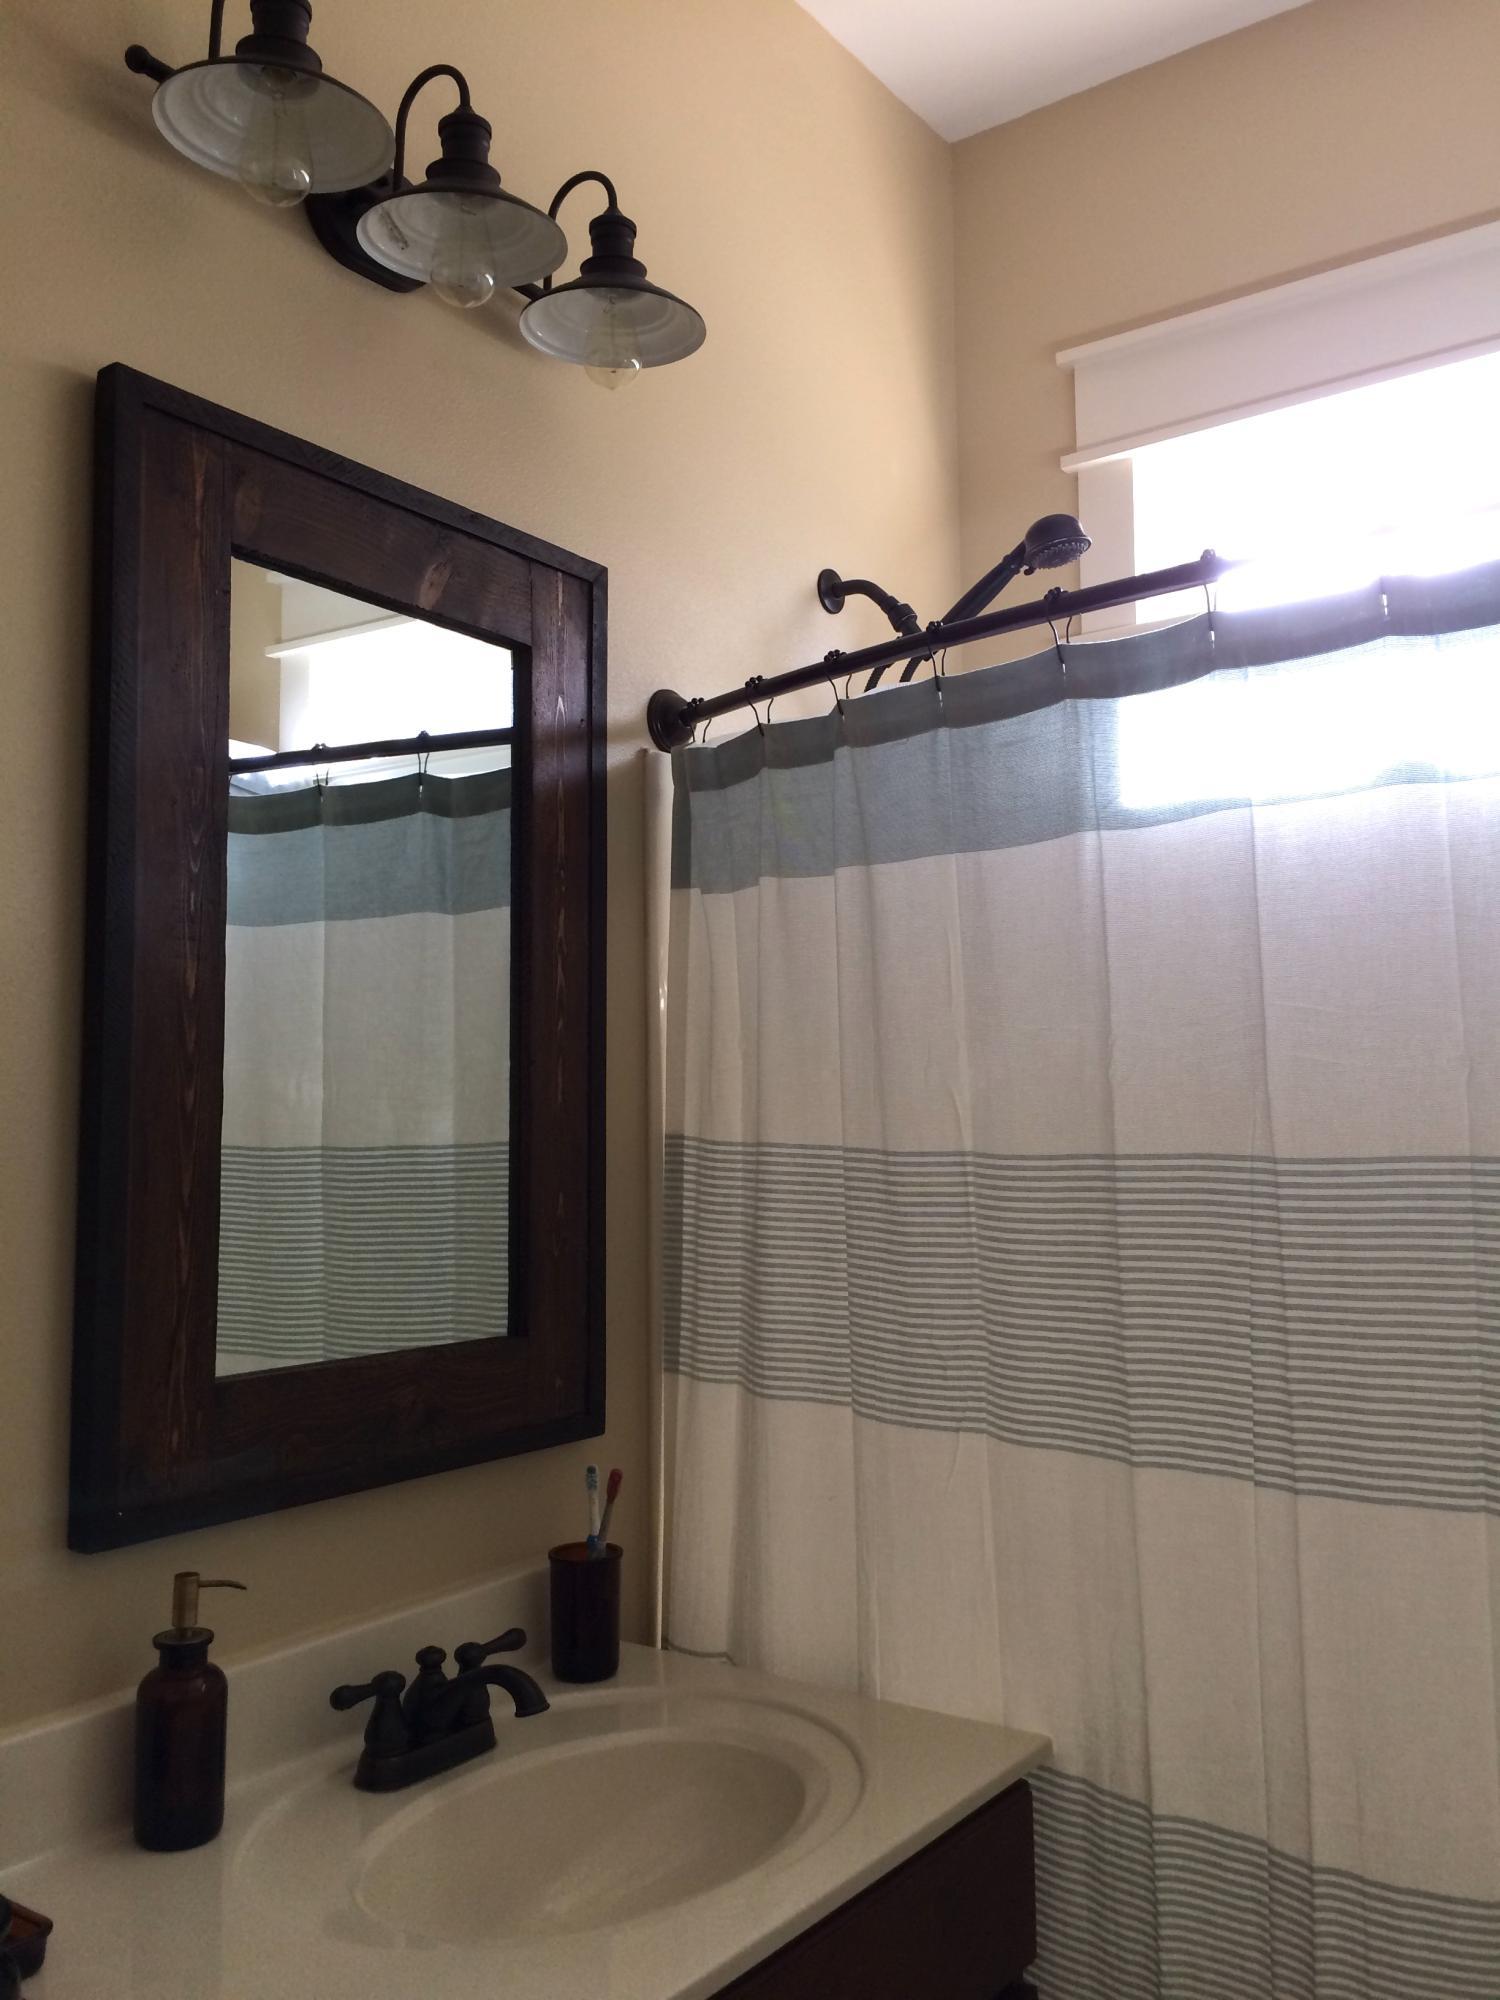 39 Maritime,Santa Rosa Beach,Florida 32459,3 Bedrooms Bedrooms,3 BathroomsBathrooms,Detached single family,Maritime,20131126143817002353000000